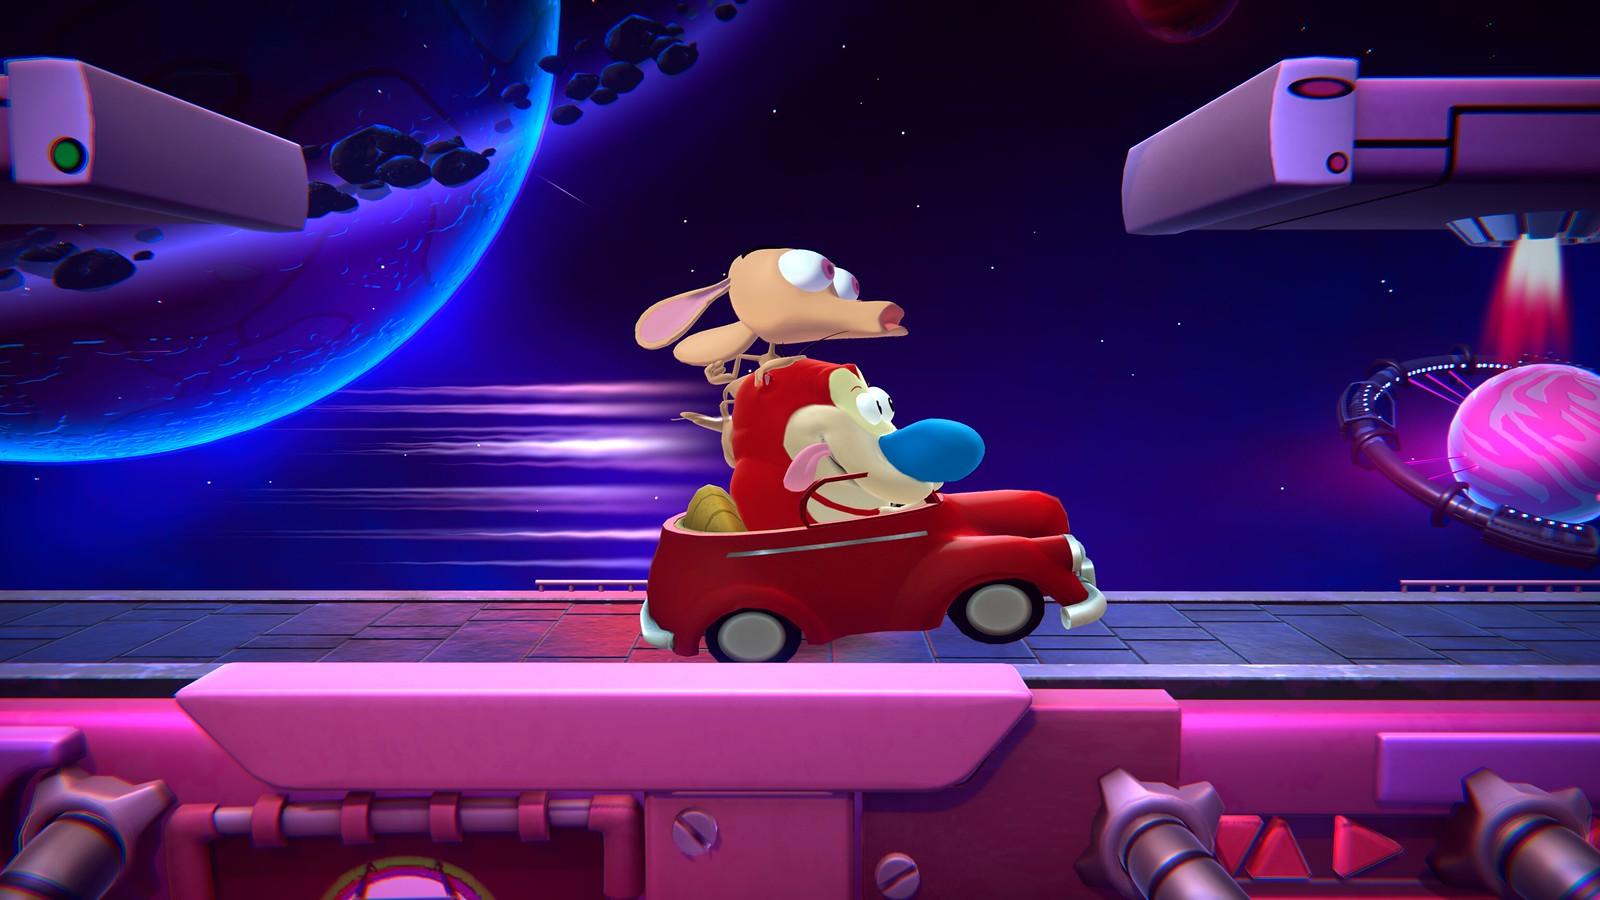 Nickelodeon cartoon characters Ren & Stimpy shown in a speeding car in Nickelodeon All-Star Brawl